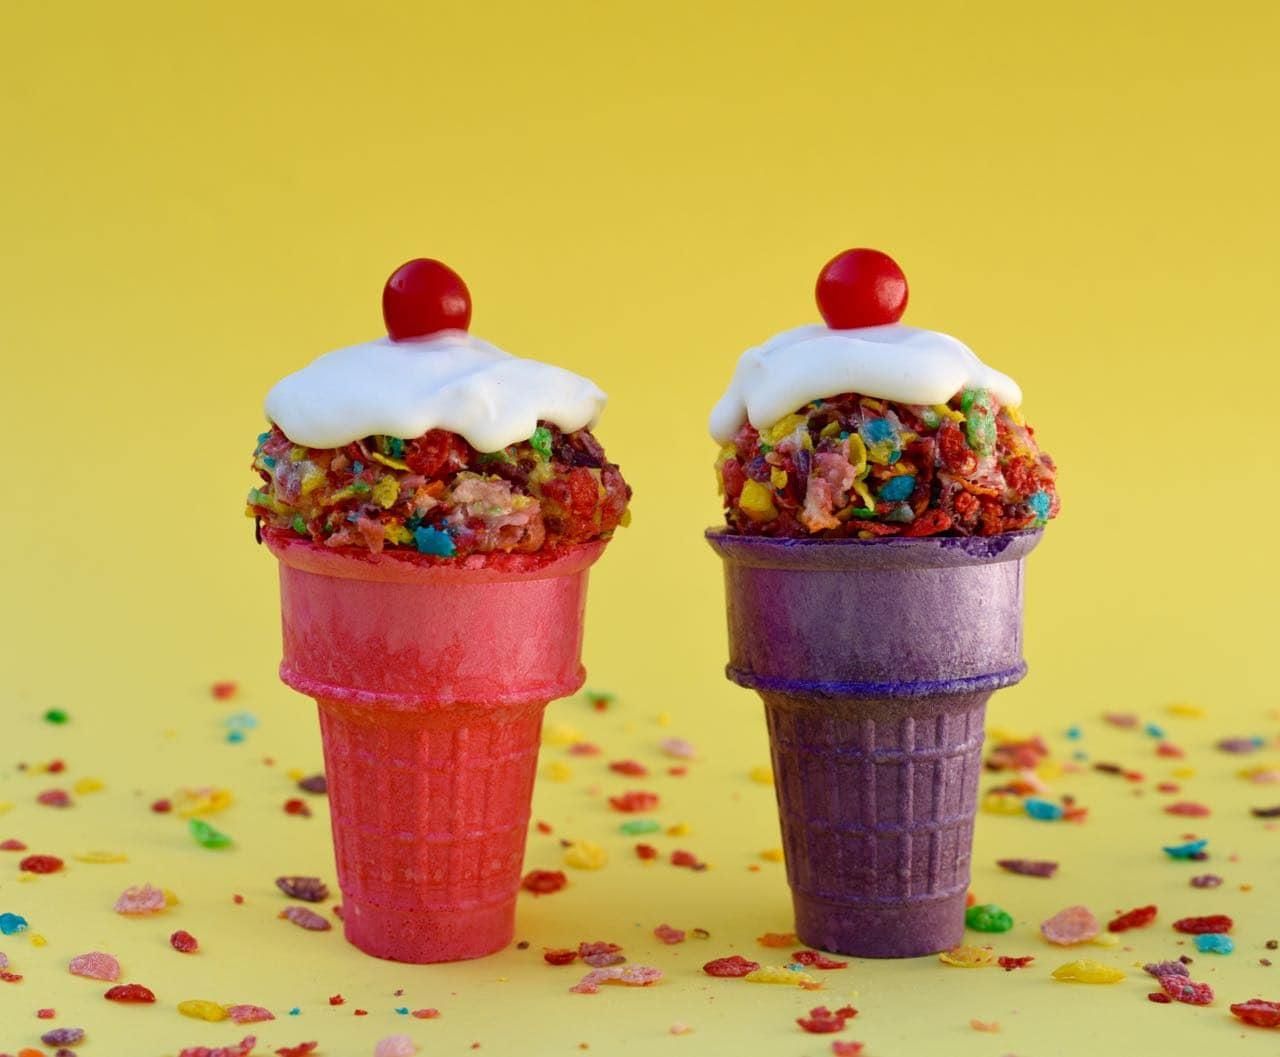 Fruity Pebbles Ice Cream Cones